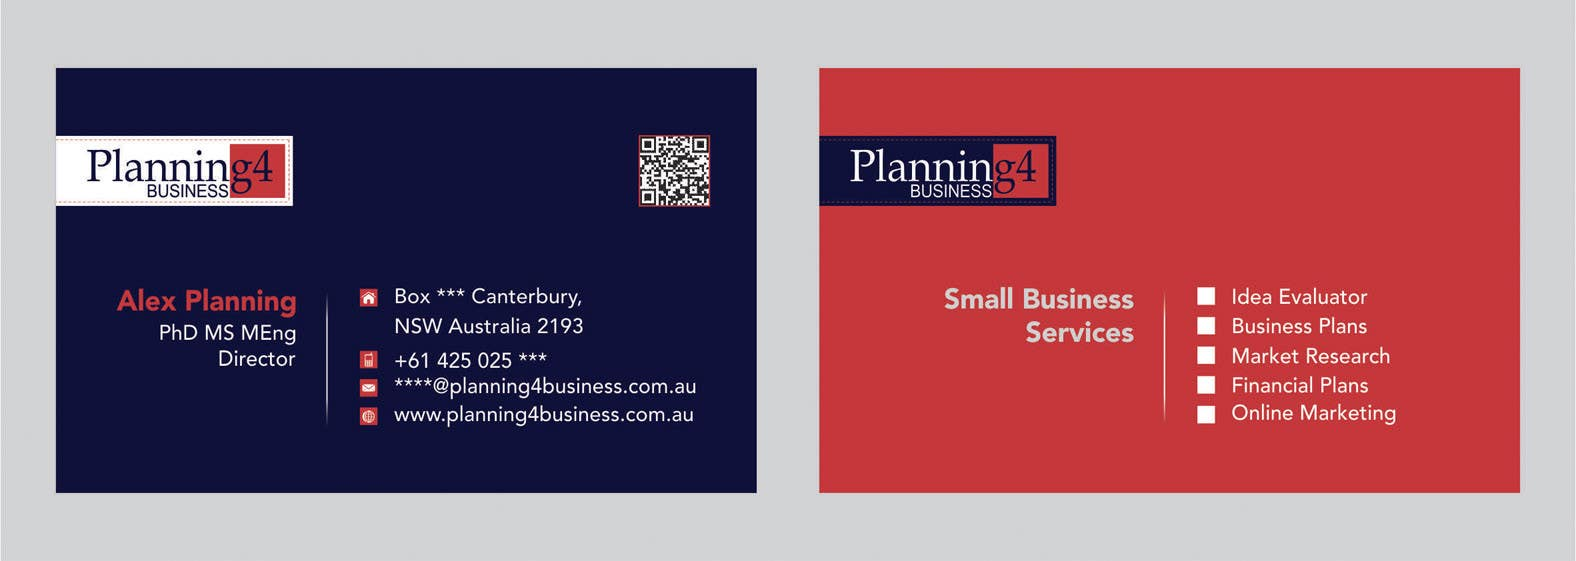 Penyertaan Peraduan #32 untuk Design some Business Cards for a business consultant